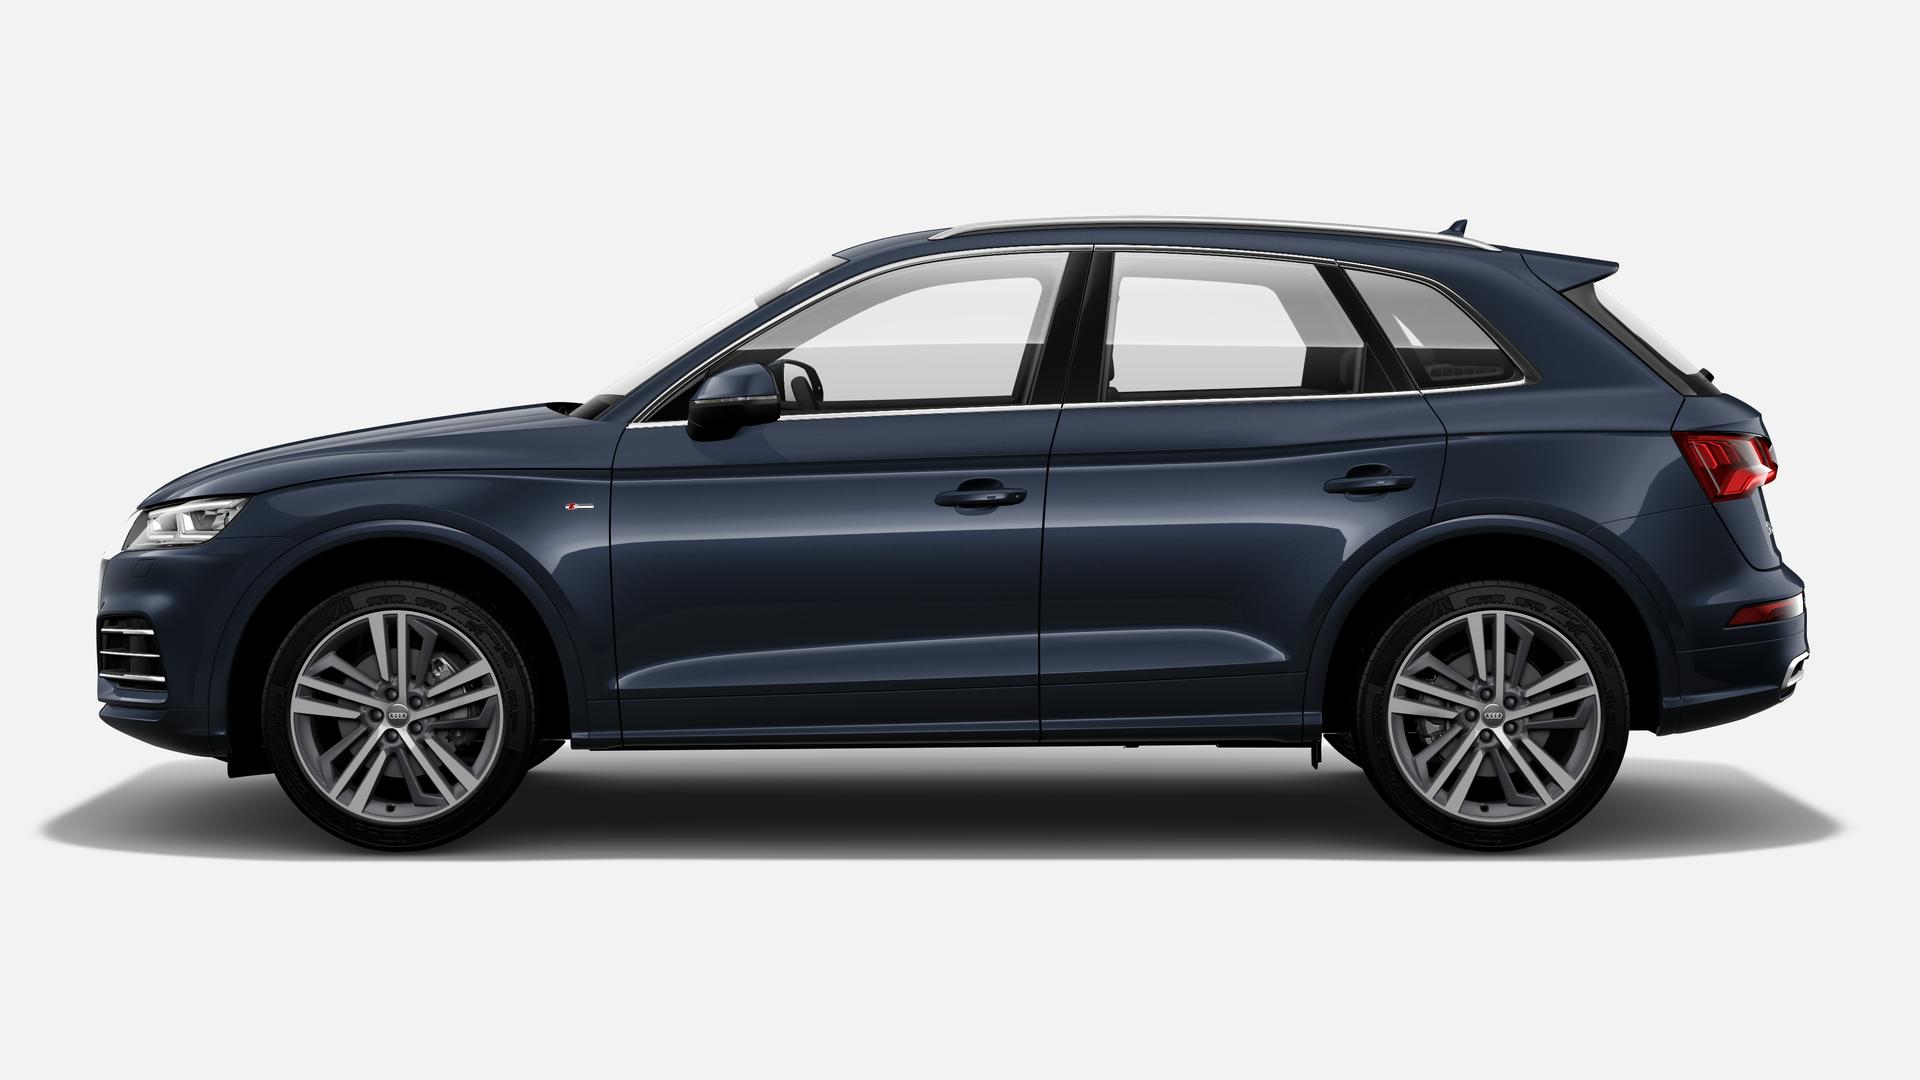 Vista Lateral izquierda de Audi Q5 35 TDI S Line Quattro S Tronic 120 kW (163 CV)